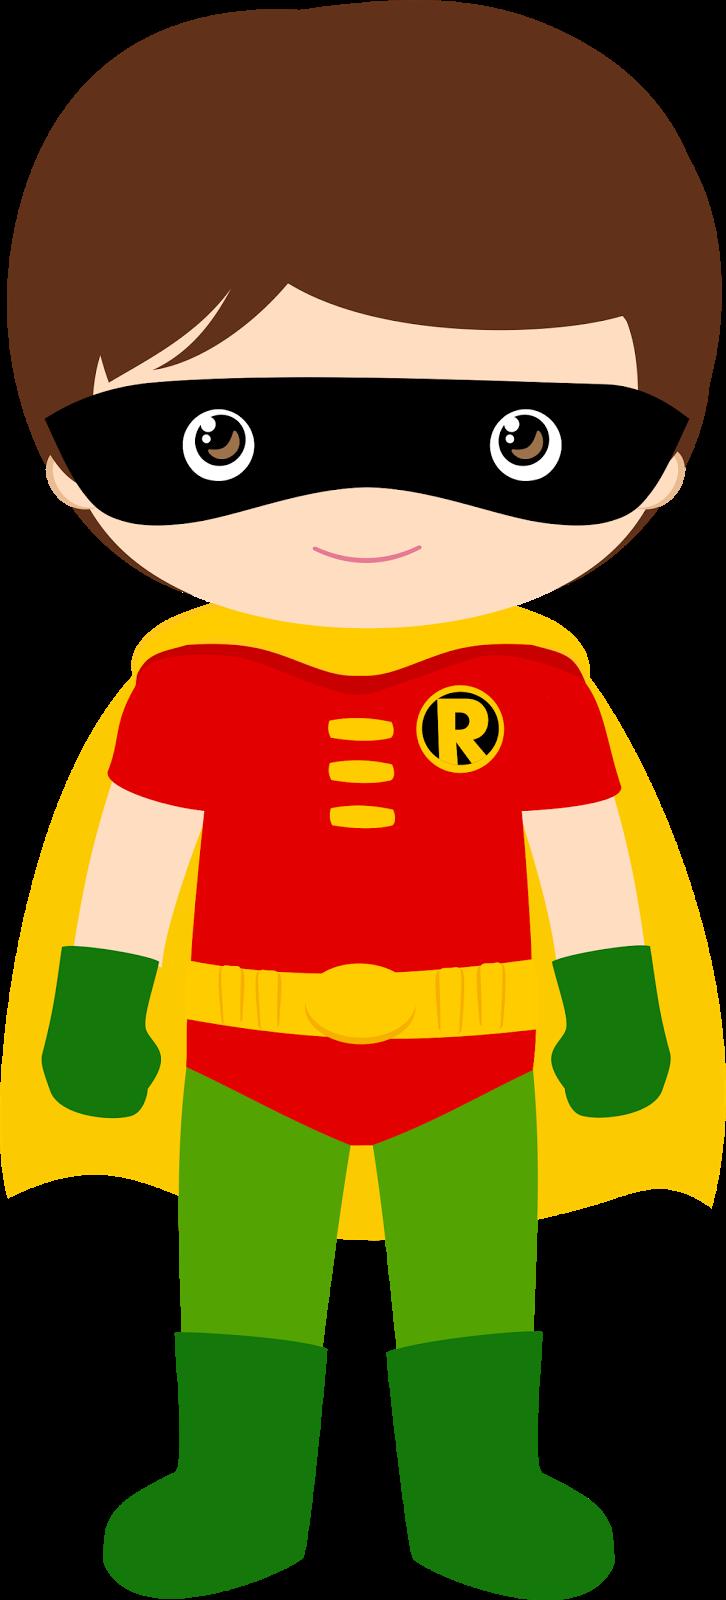 Clipart kids imagination. Characters of batman version